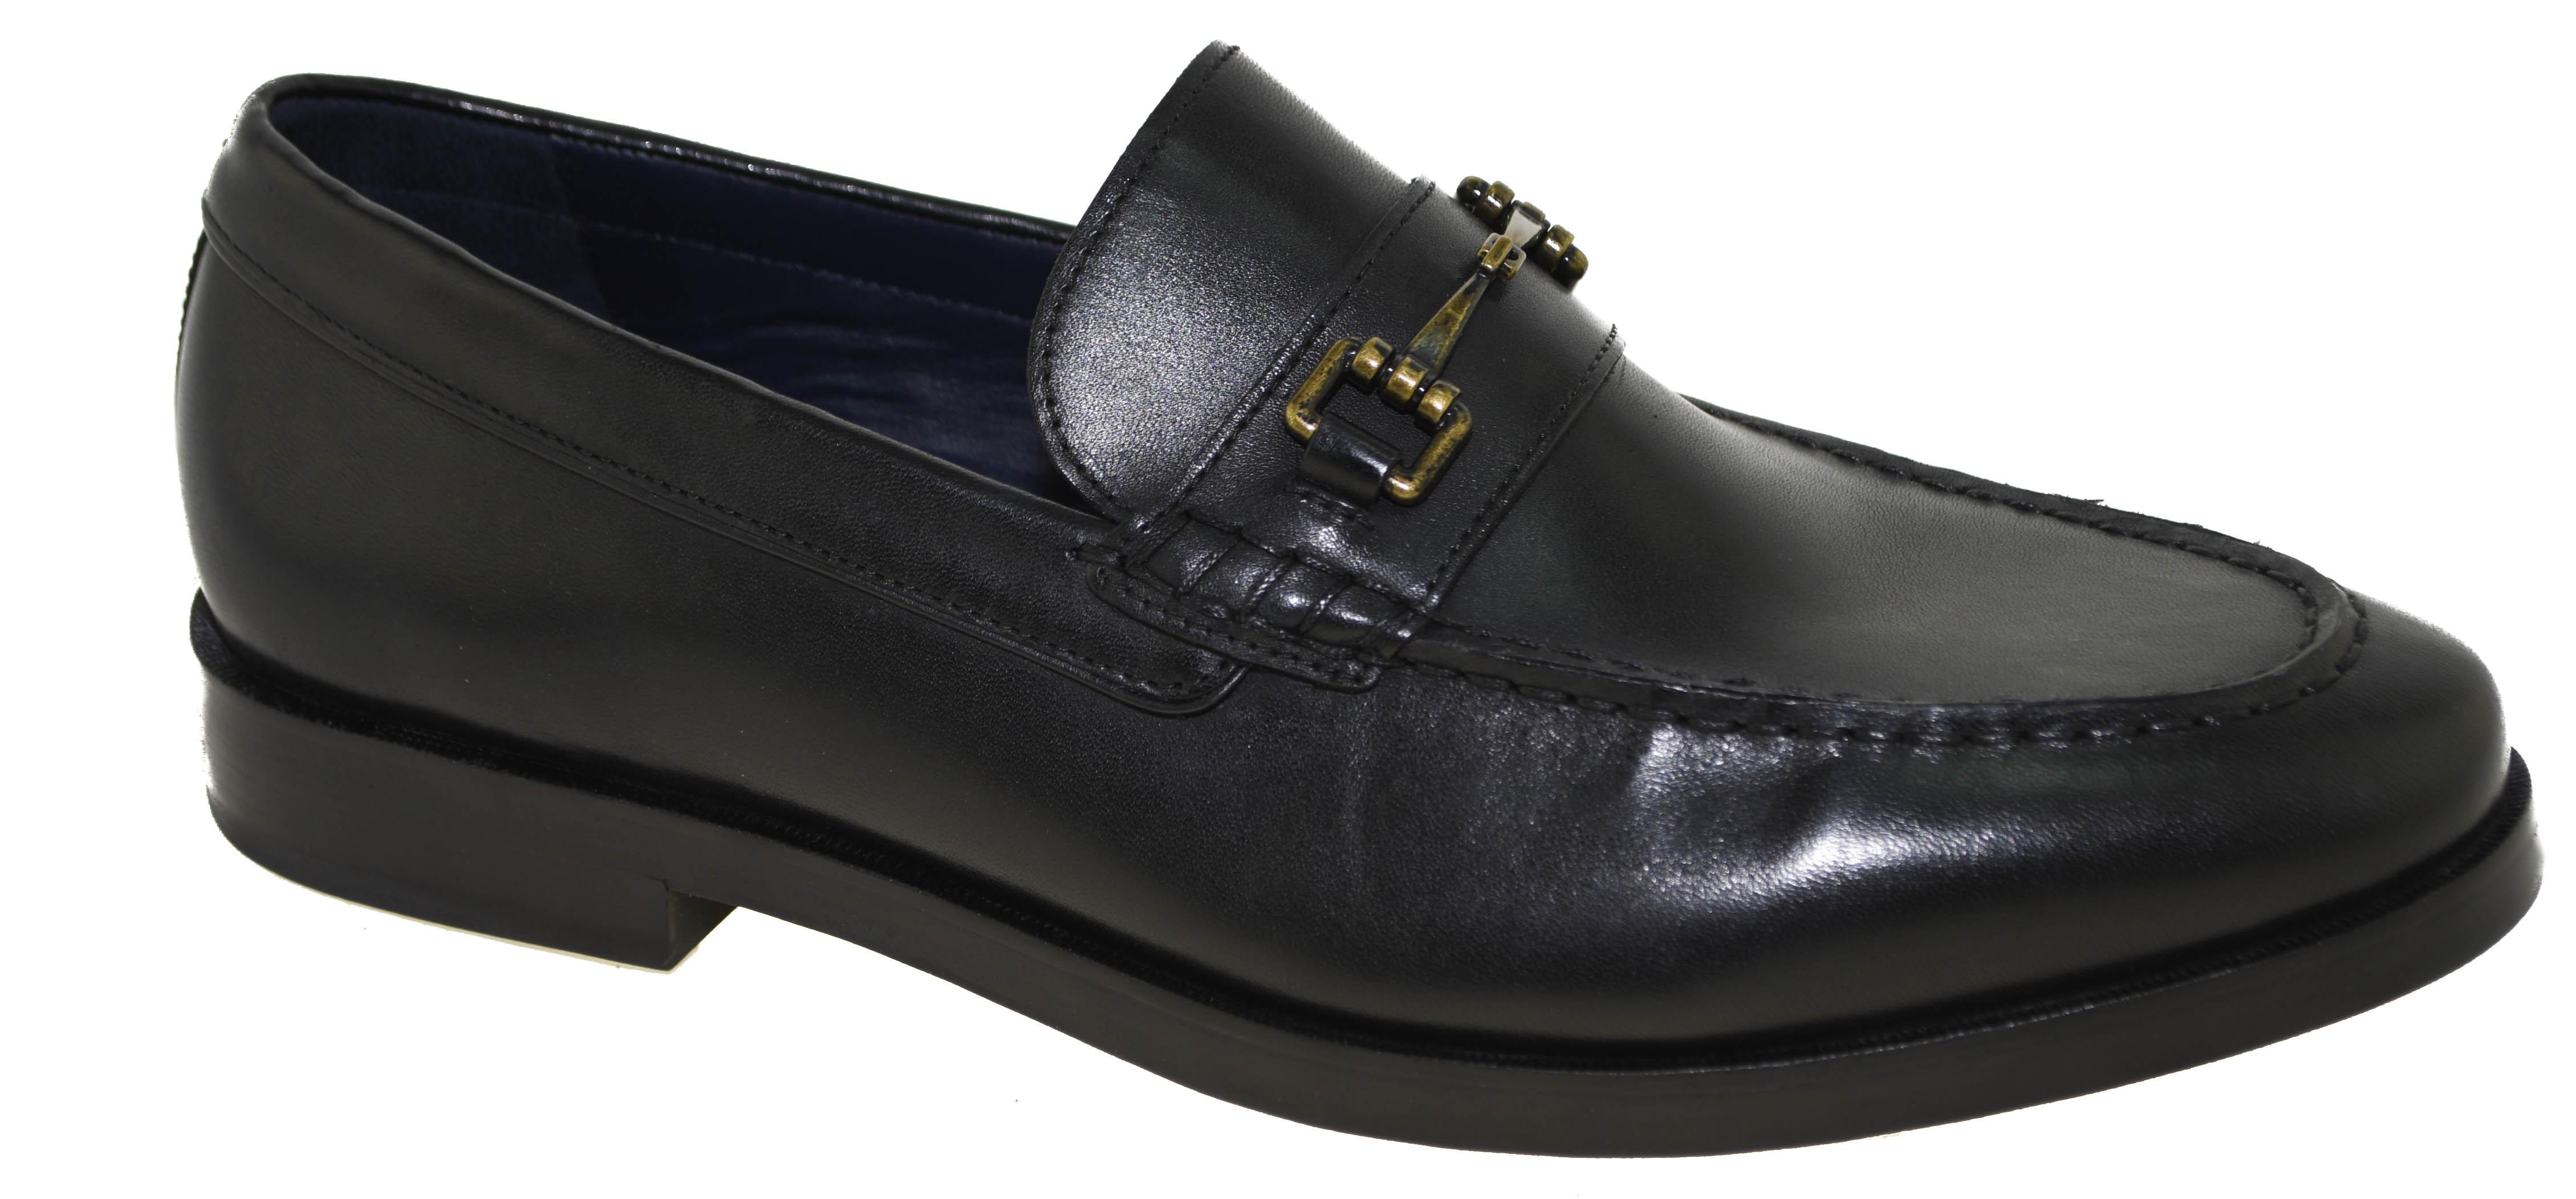 5594ec08018 Cole Haan Men s Hamilton Grand Bit Loafer Black Style C25135